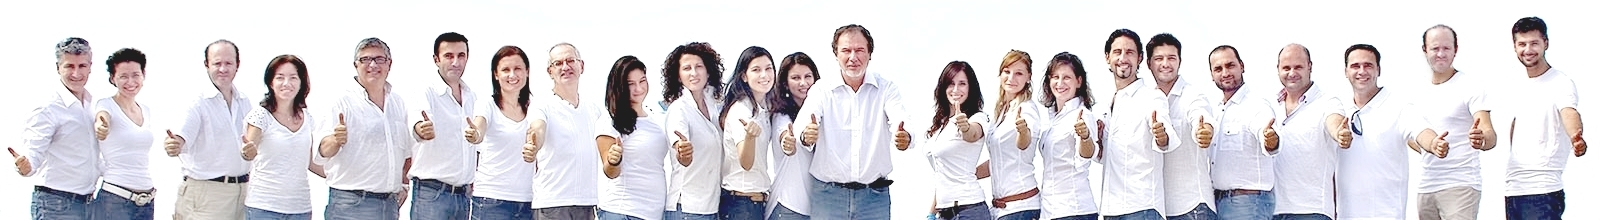 Team Topoprogram